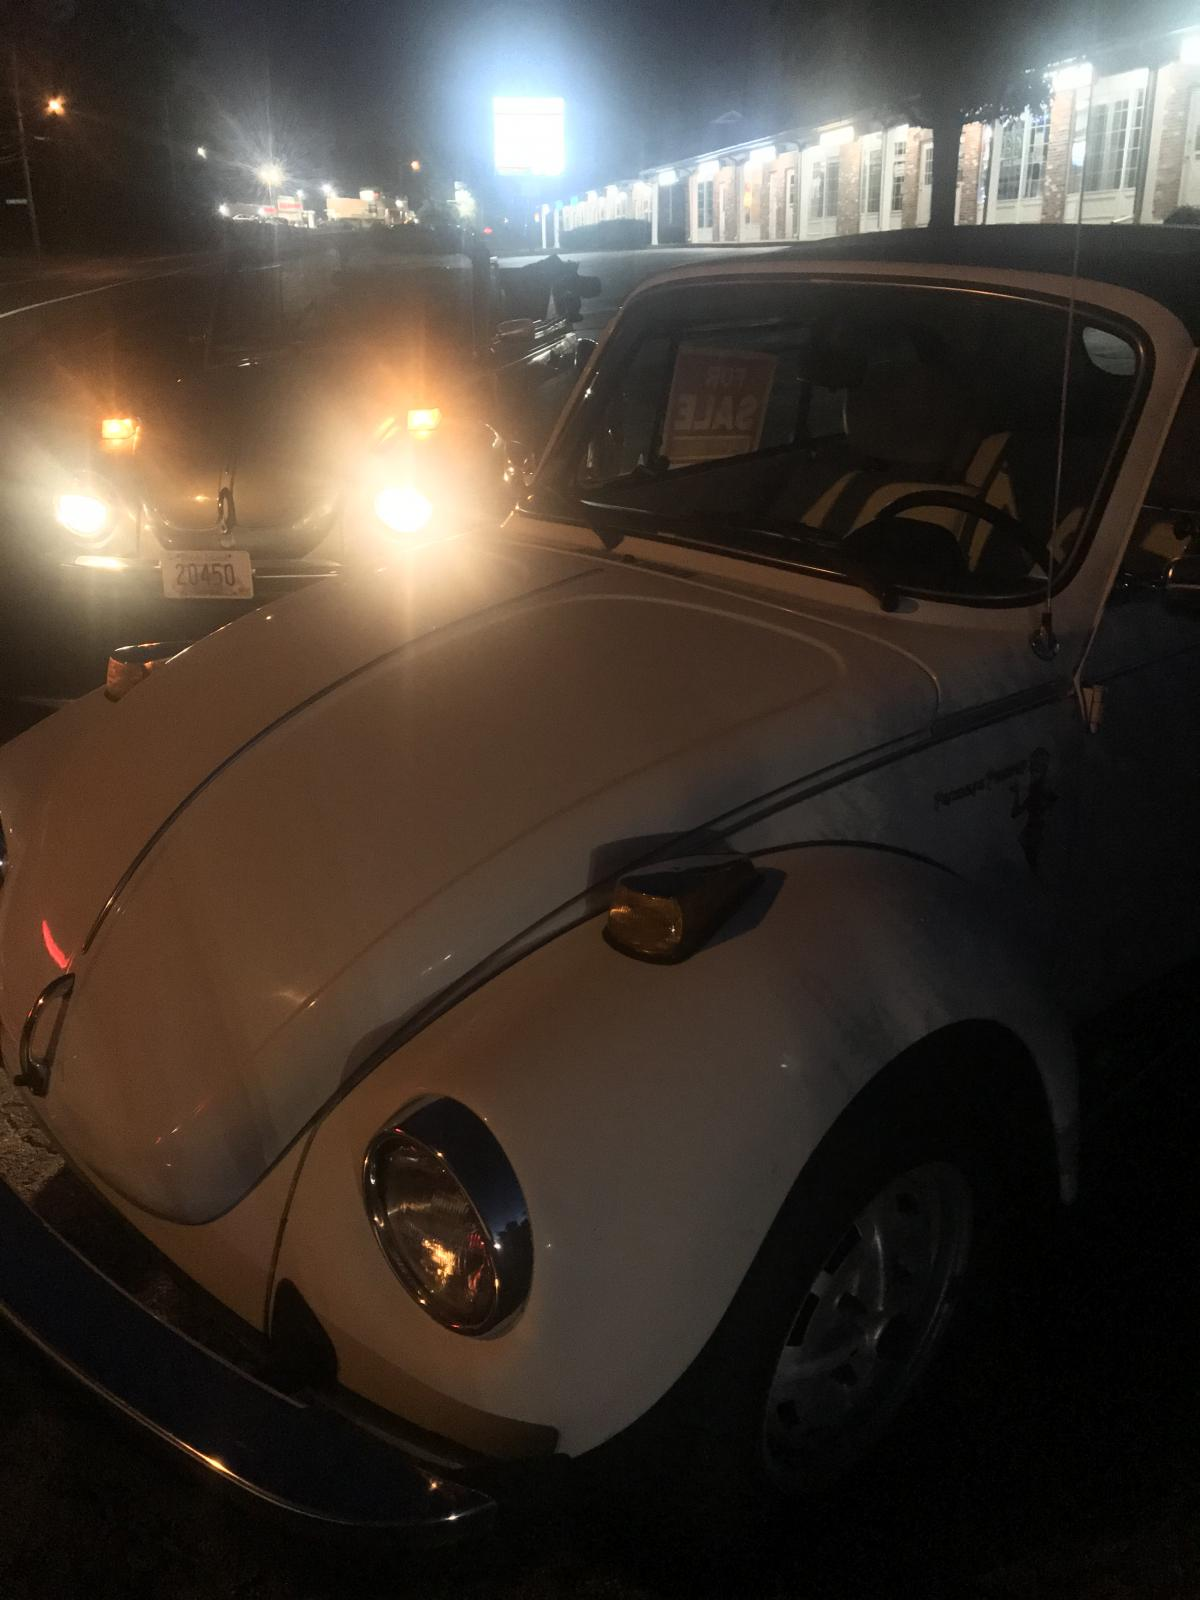 White 1978 Convertible Beetle